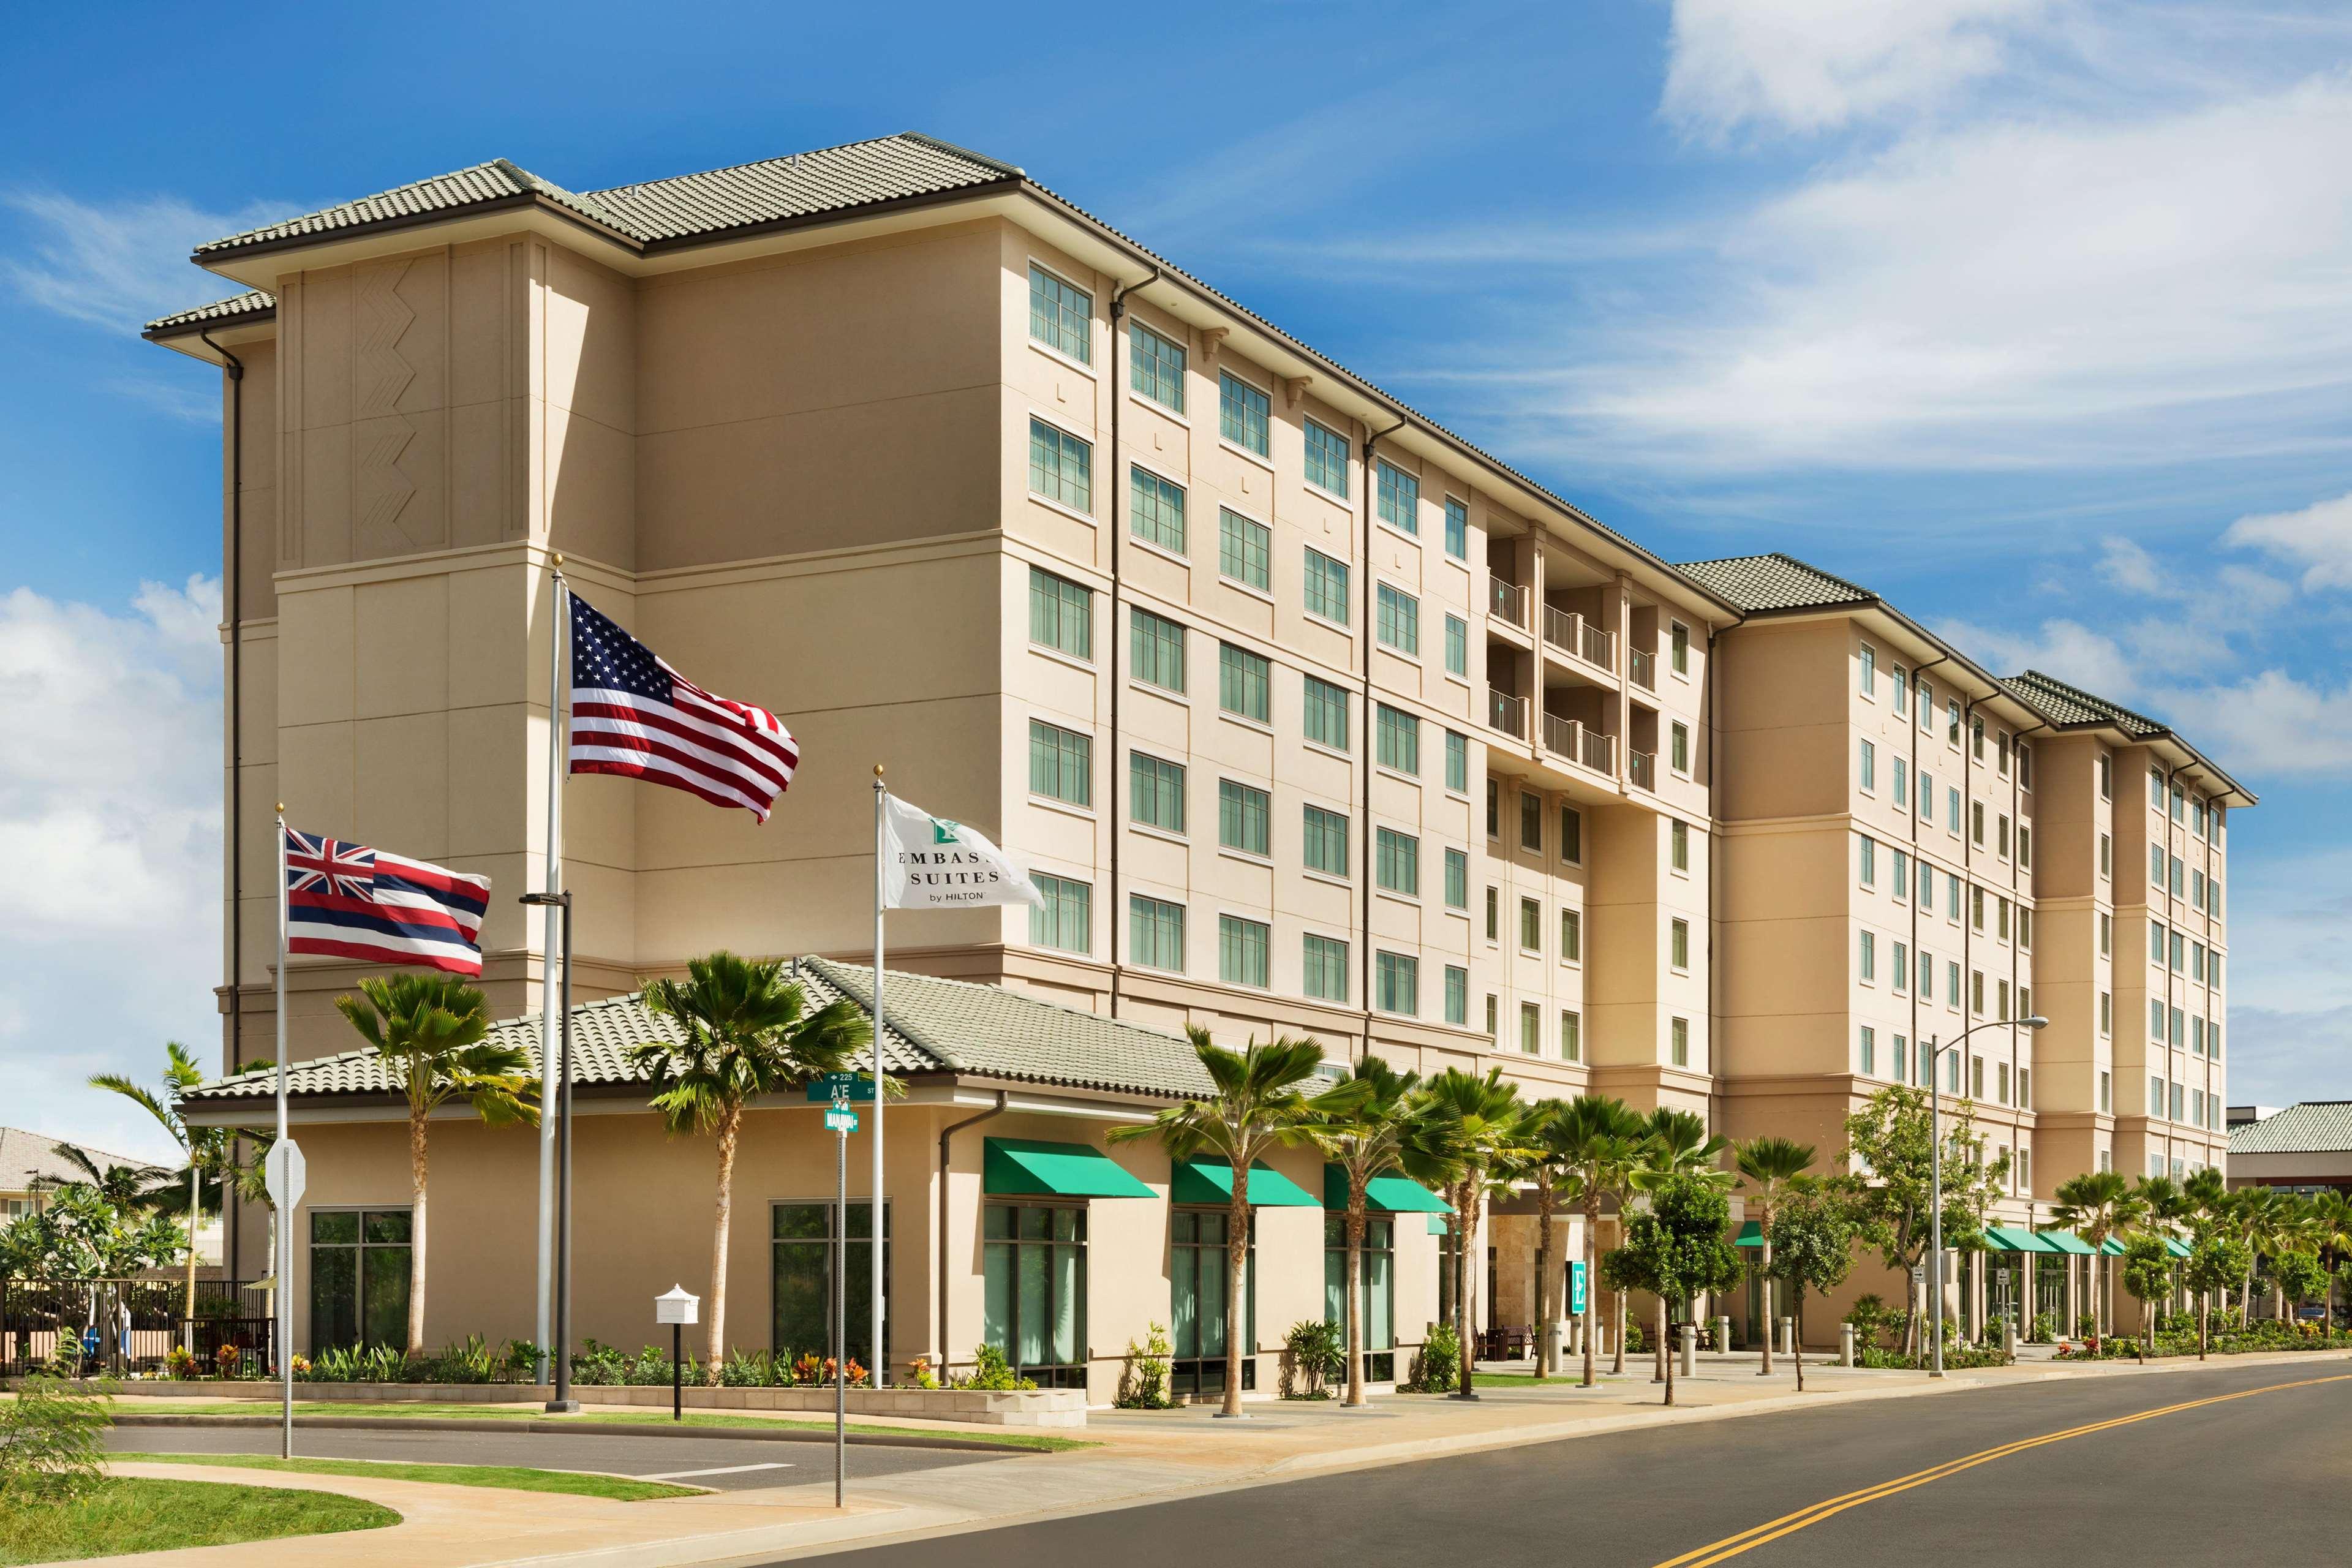 Embassy Suites by Hilton Oahu Kapolei image 3